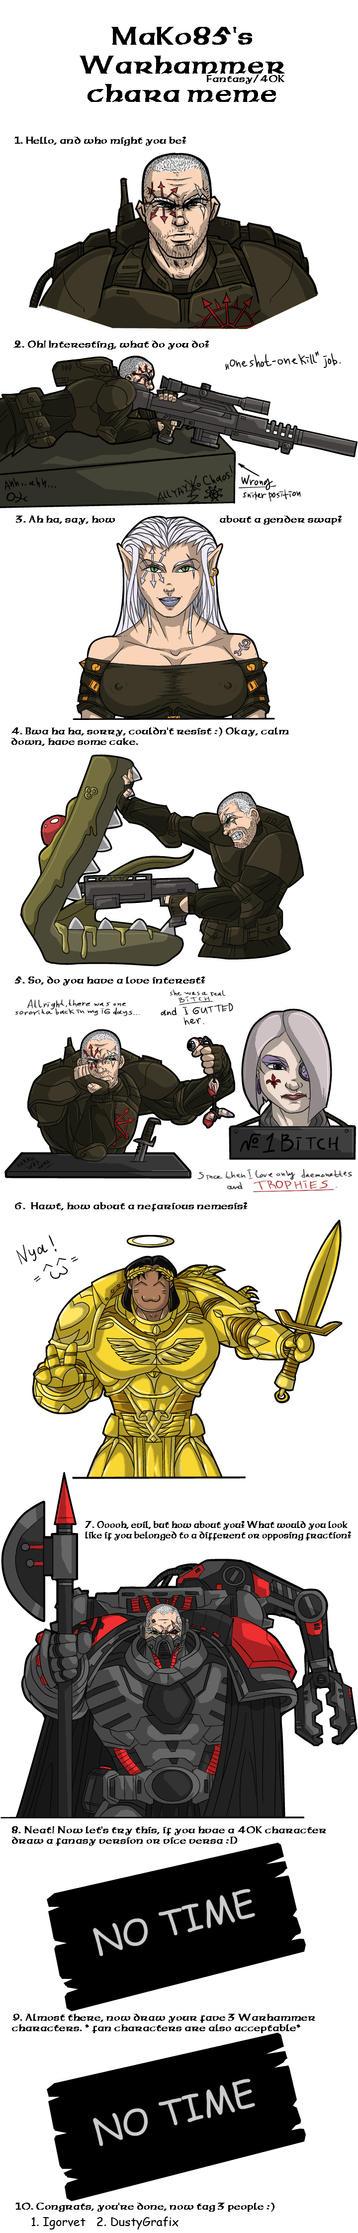 Warhammer 40k meme by Kain-Moerder on DeviantArt